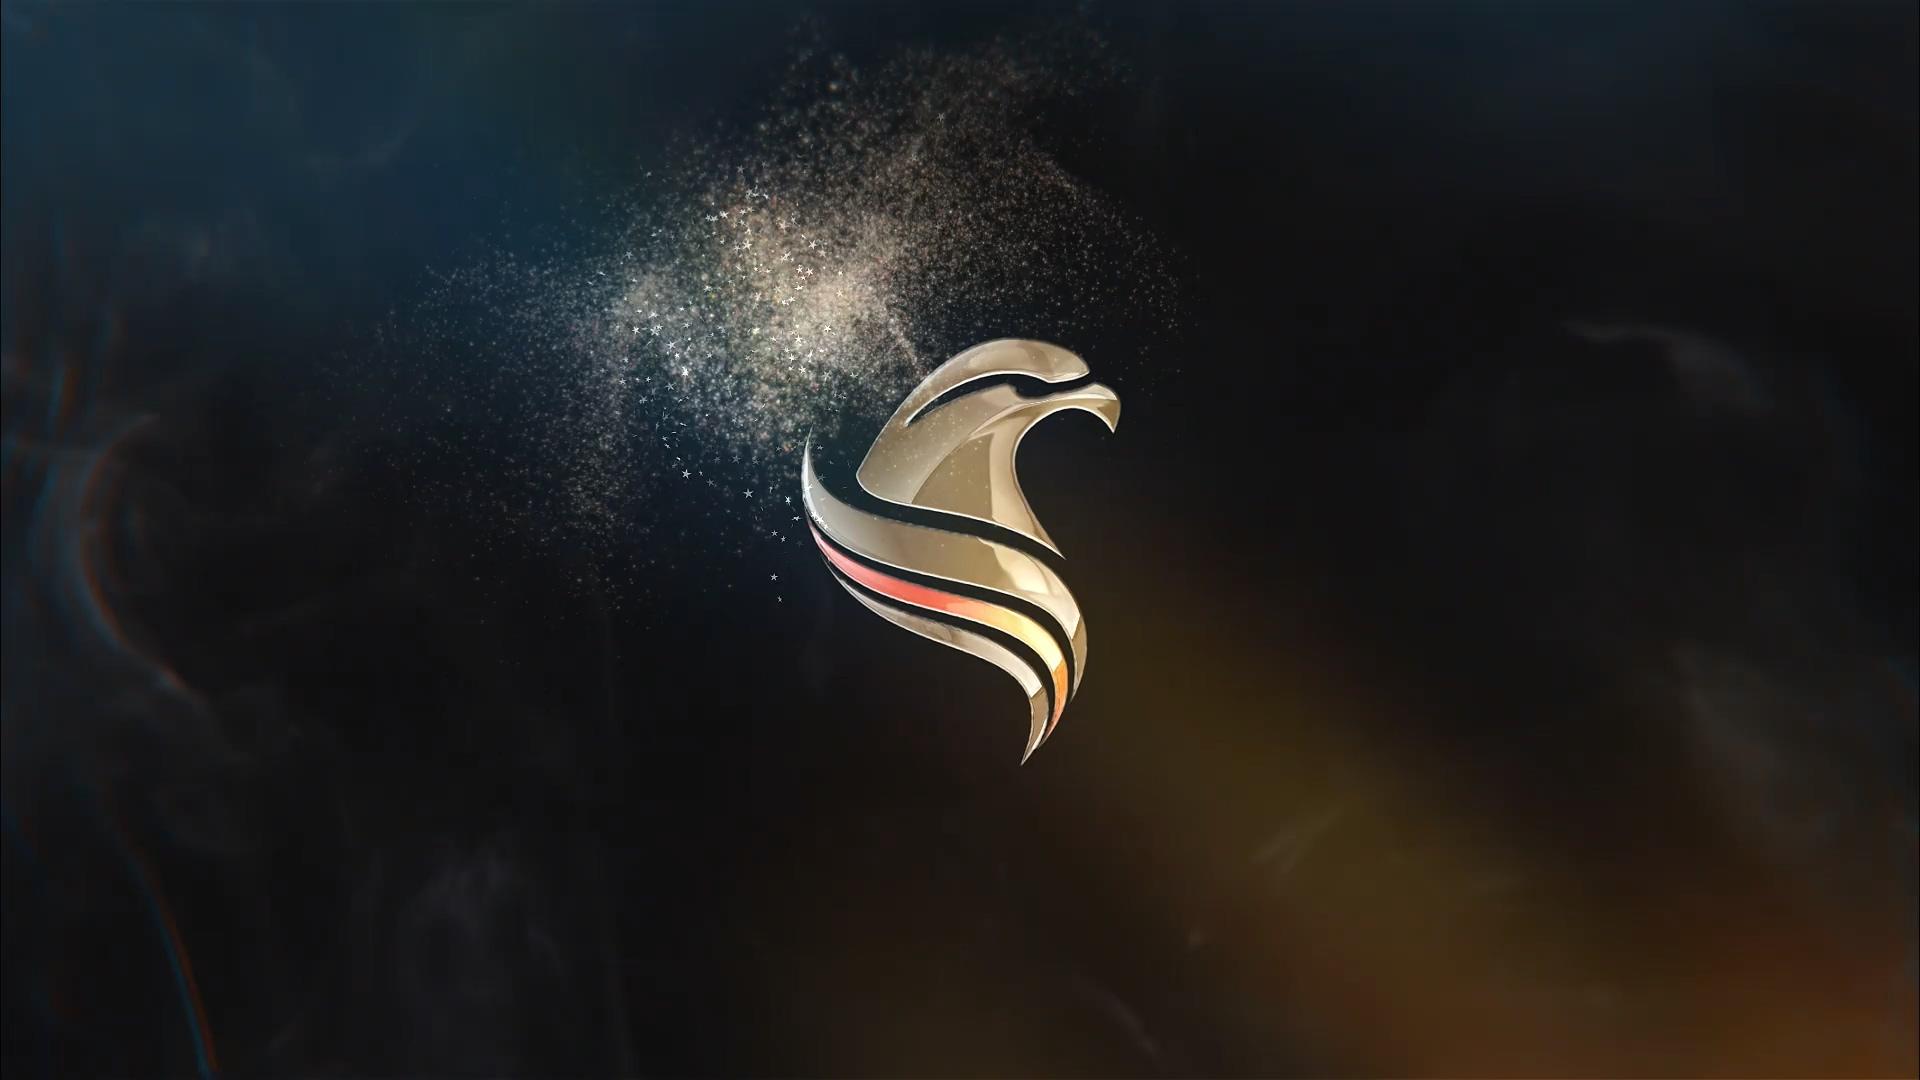 Particles粒子logo标志ae